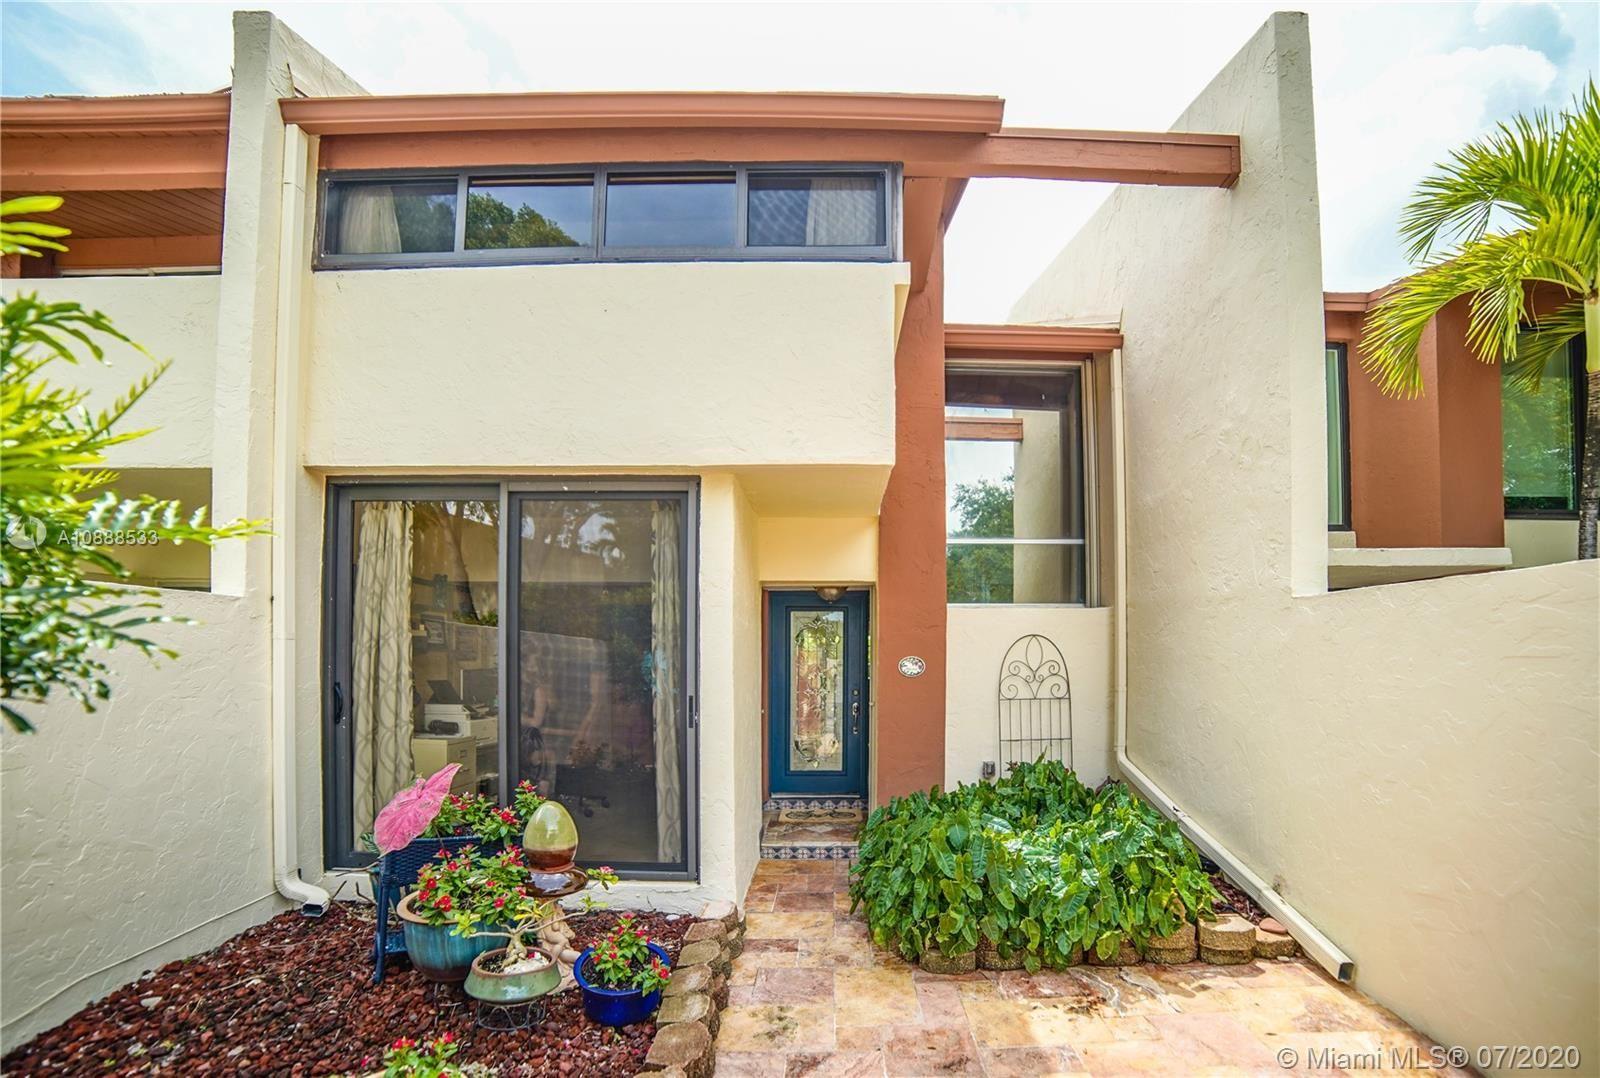 7821 SW 103rd Pl #0, Miami, FL 33173 - #: A10888533